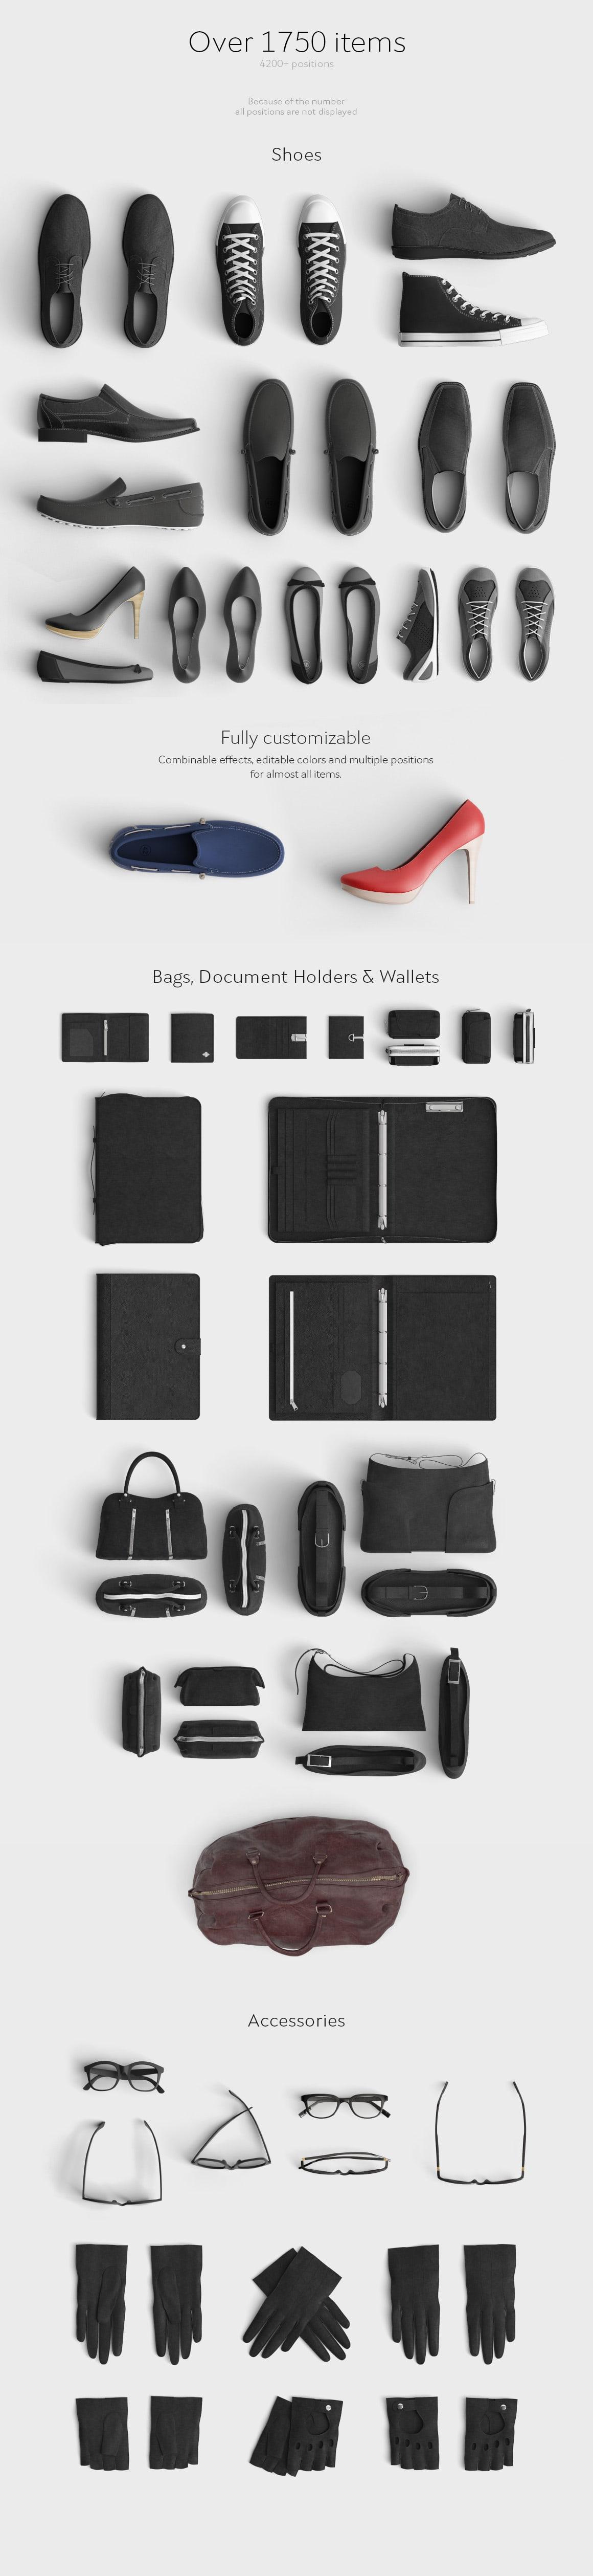 creative-market-scene-creator-bundle-15